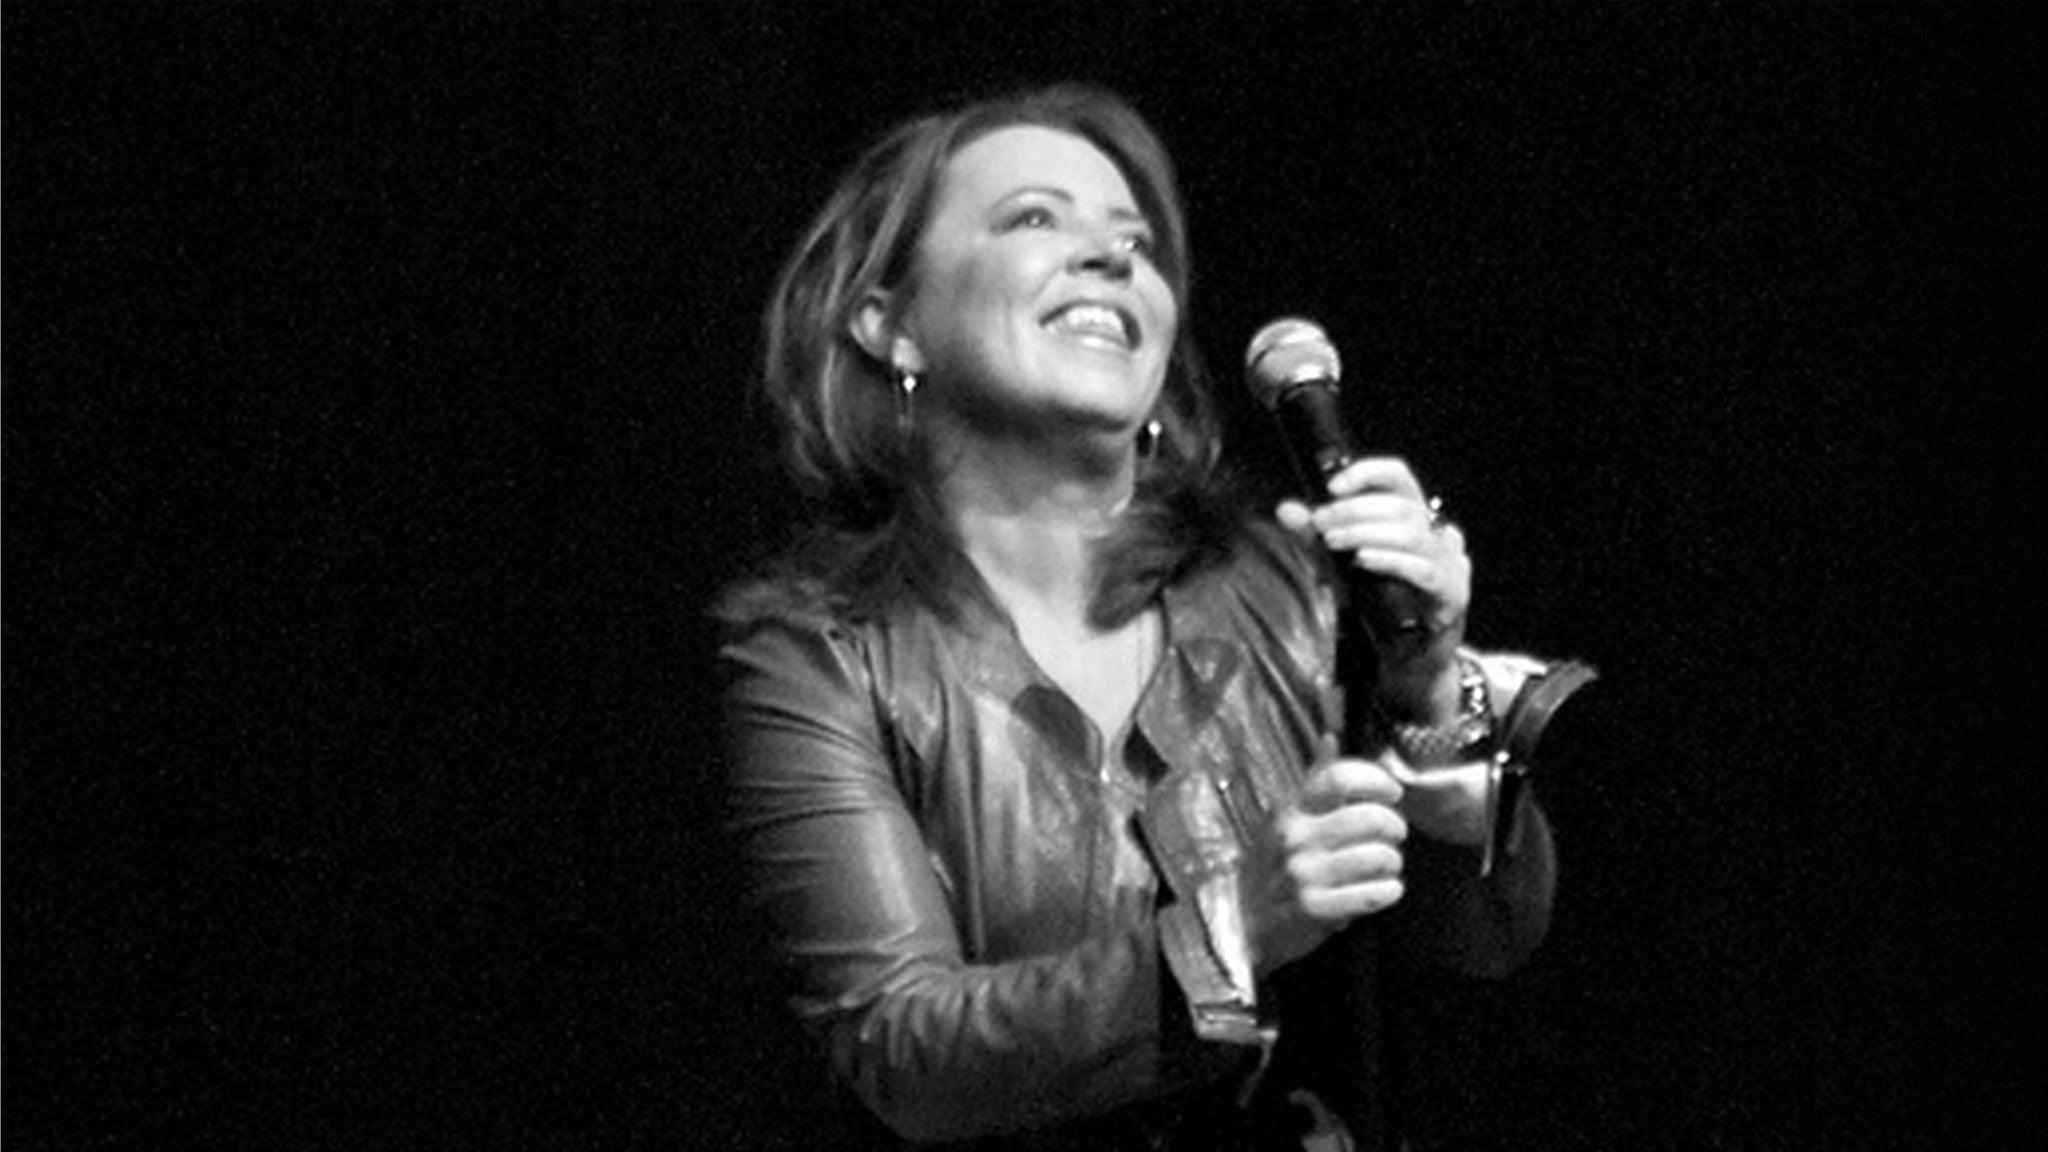 Kathleen Madigan at Ridgefield Playhouse - Ridgefield, CT 06877